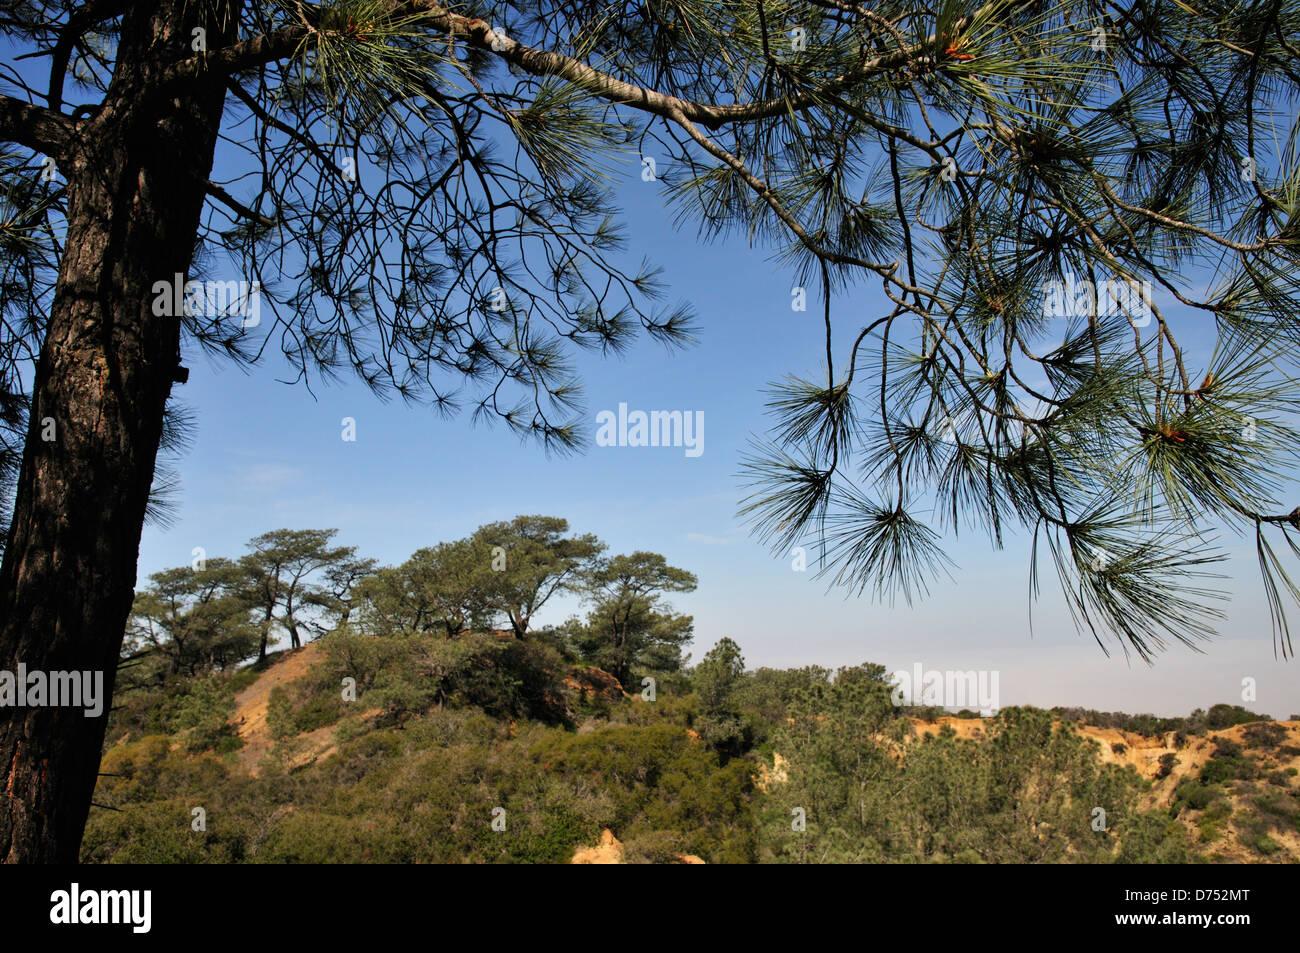 Torrey pines in Torrey Pines State Natural Reserve - Stock Image